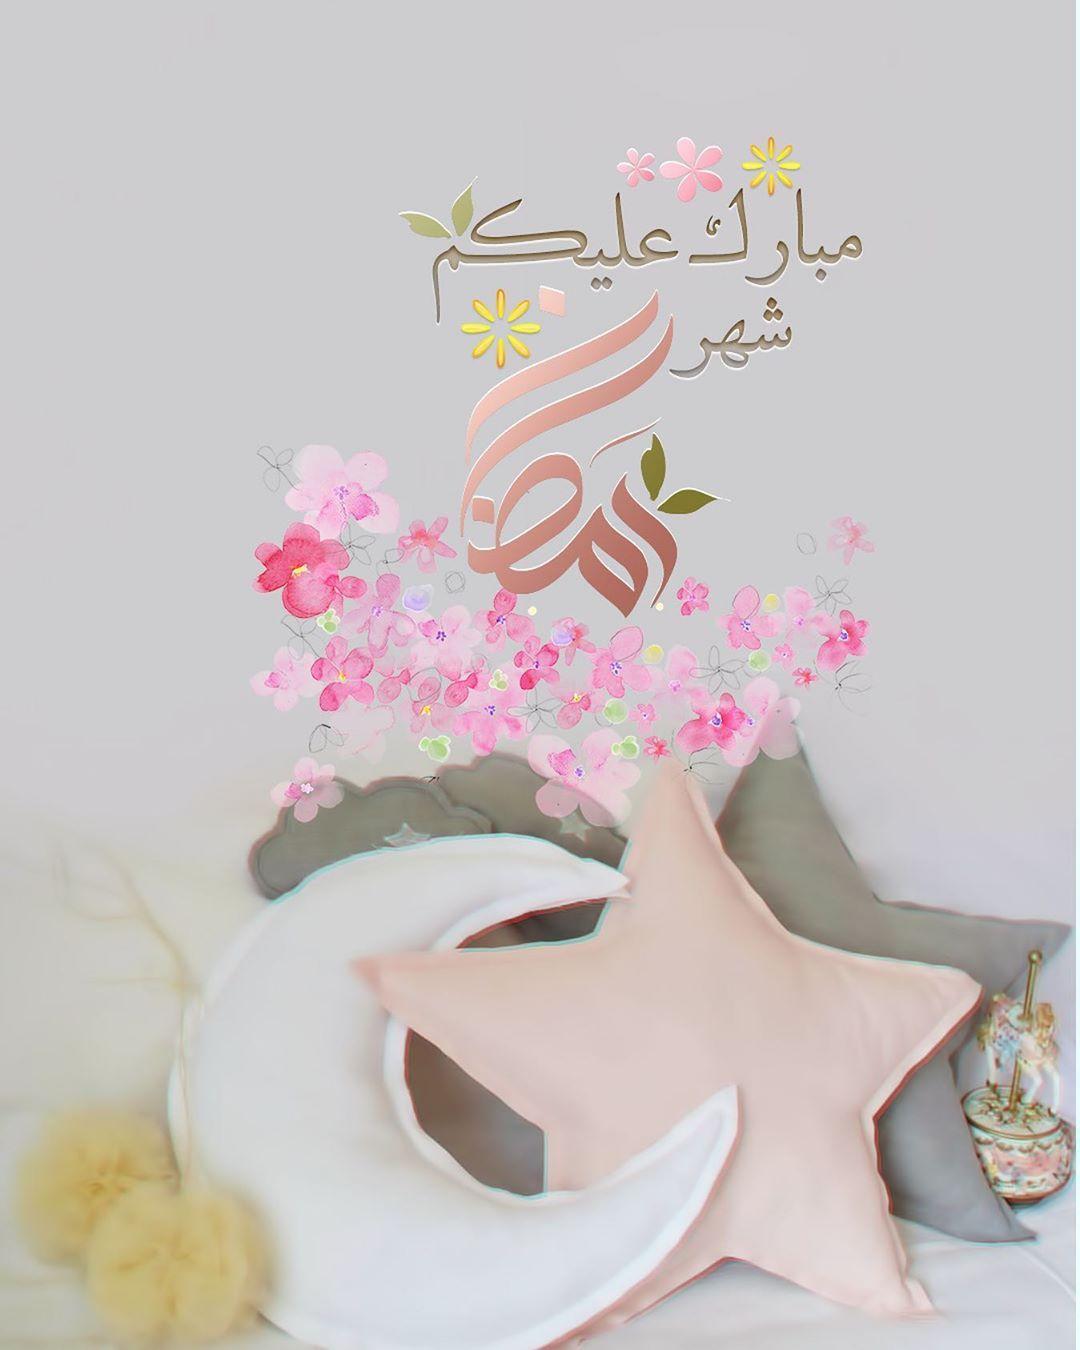 P E A R L A On Instagram م بارك عليكم ش هر رمضان وكل عام وأنت م وجميع أهلكم وأحبابكم تنع مون ب Home Decor Decals Decor Home Decor